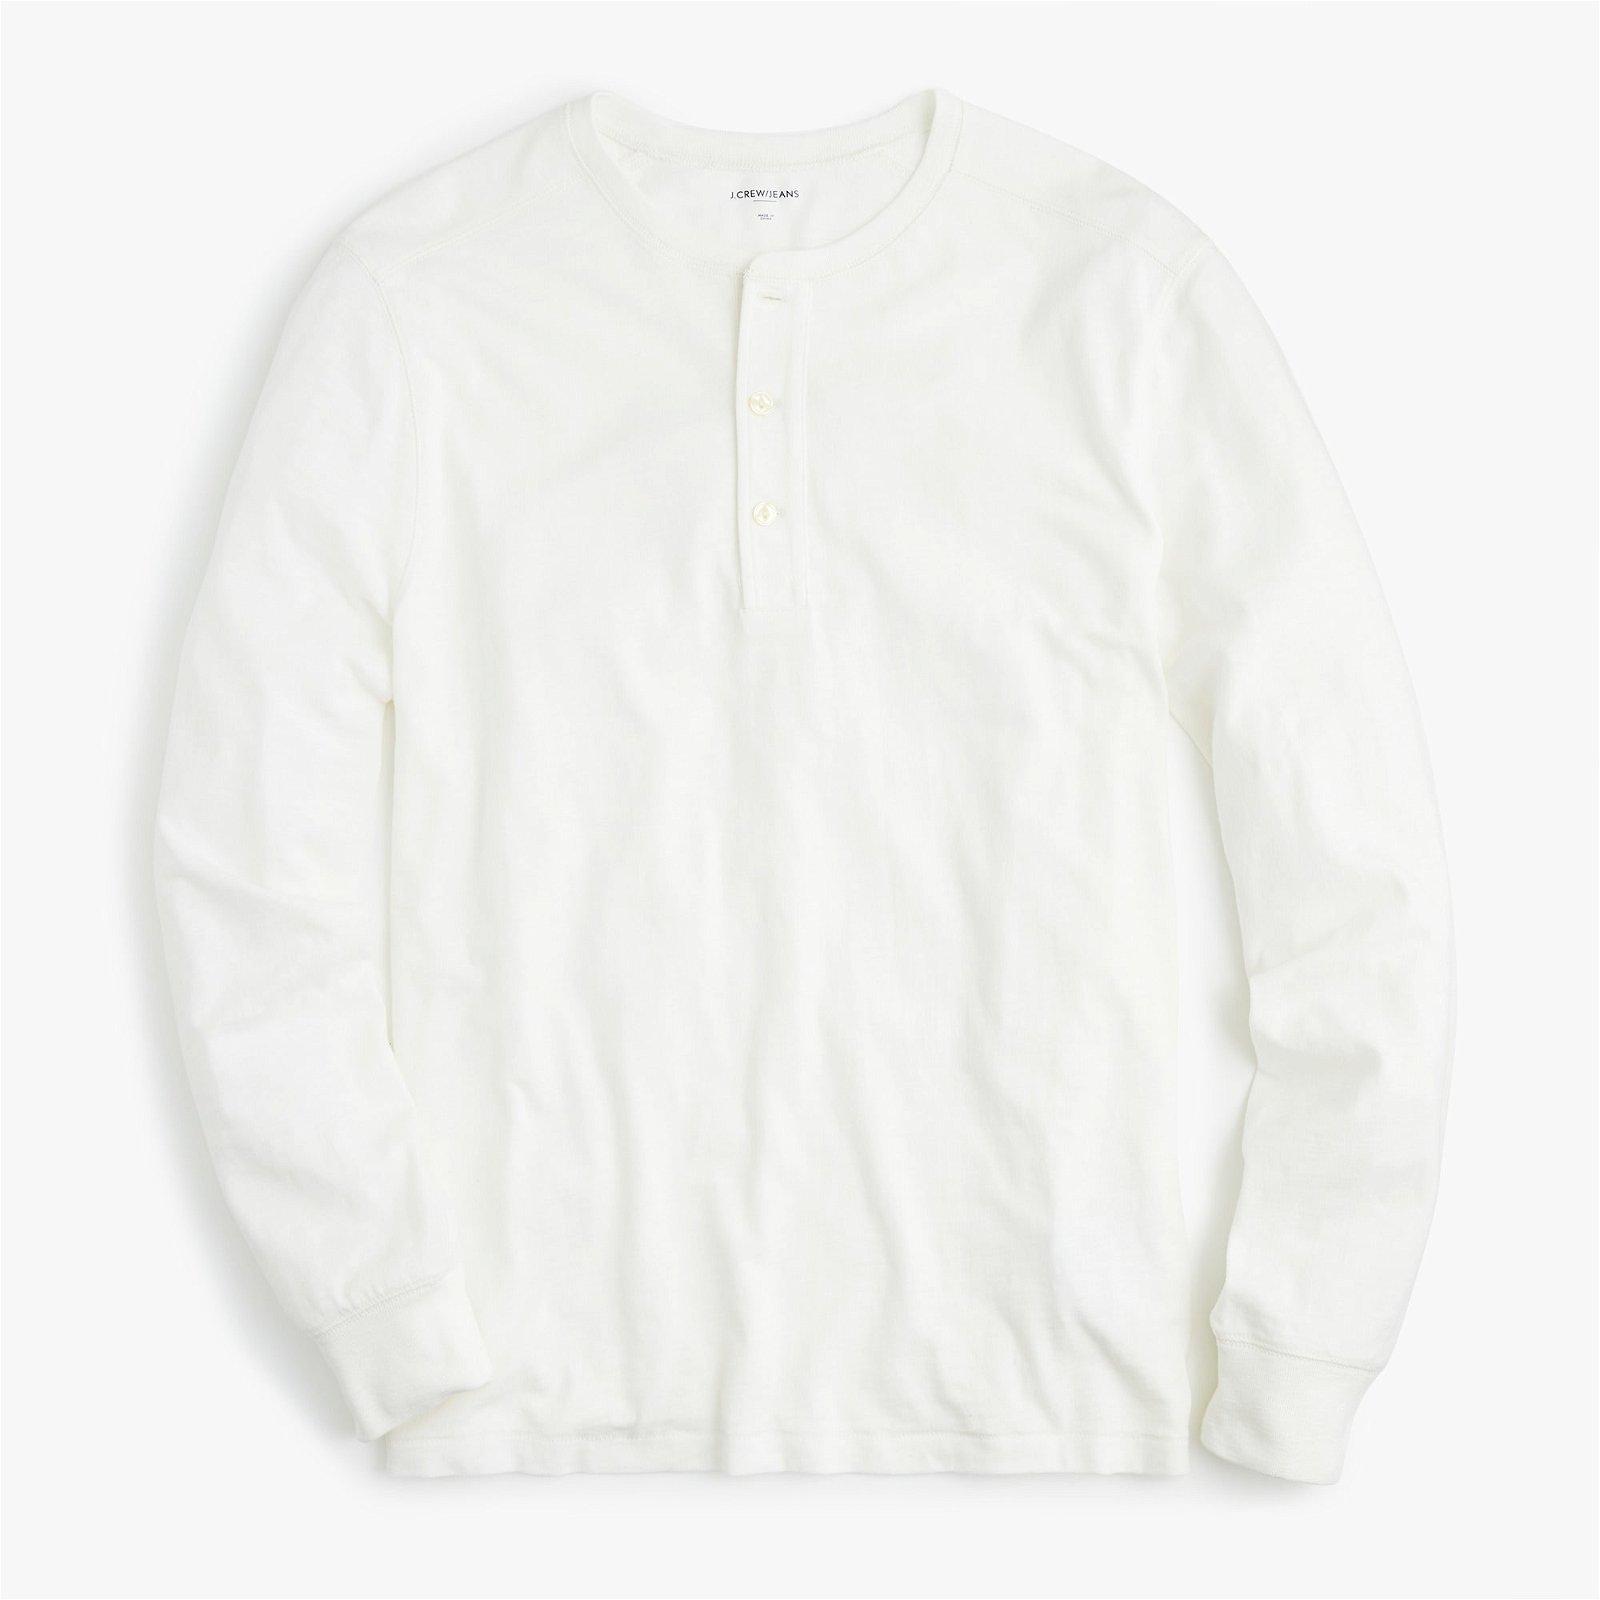 Garment-dyed slub cotton henley